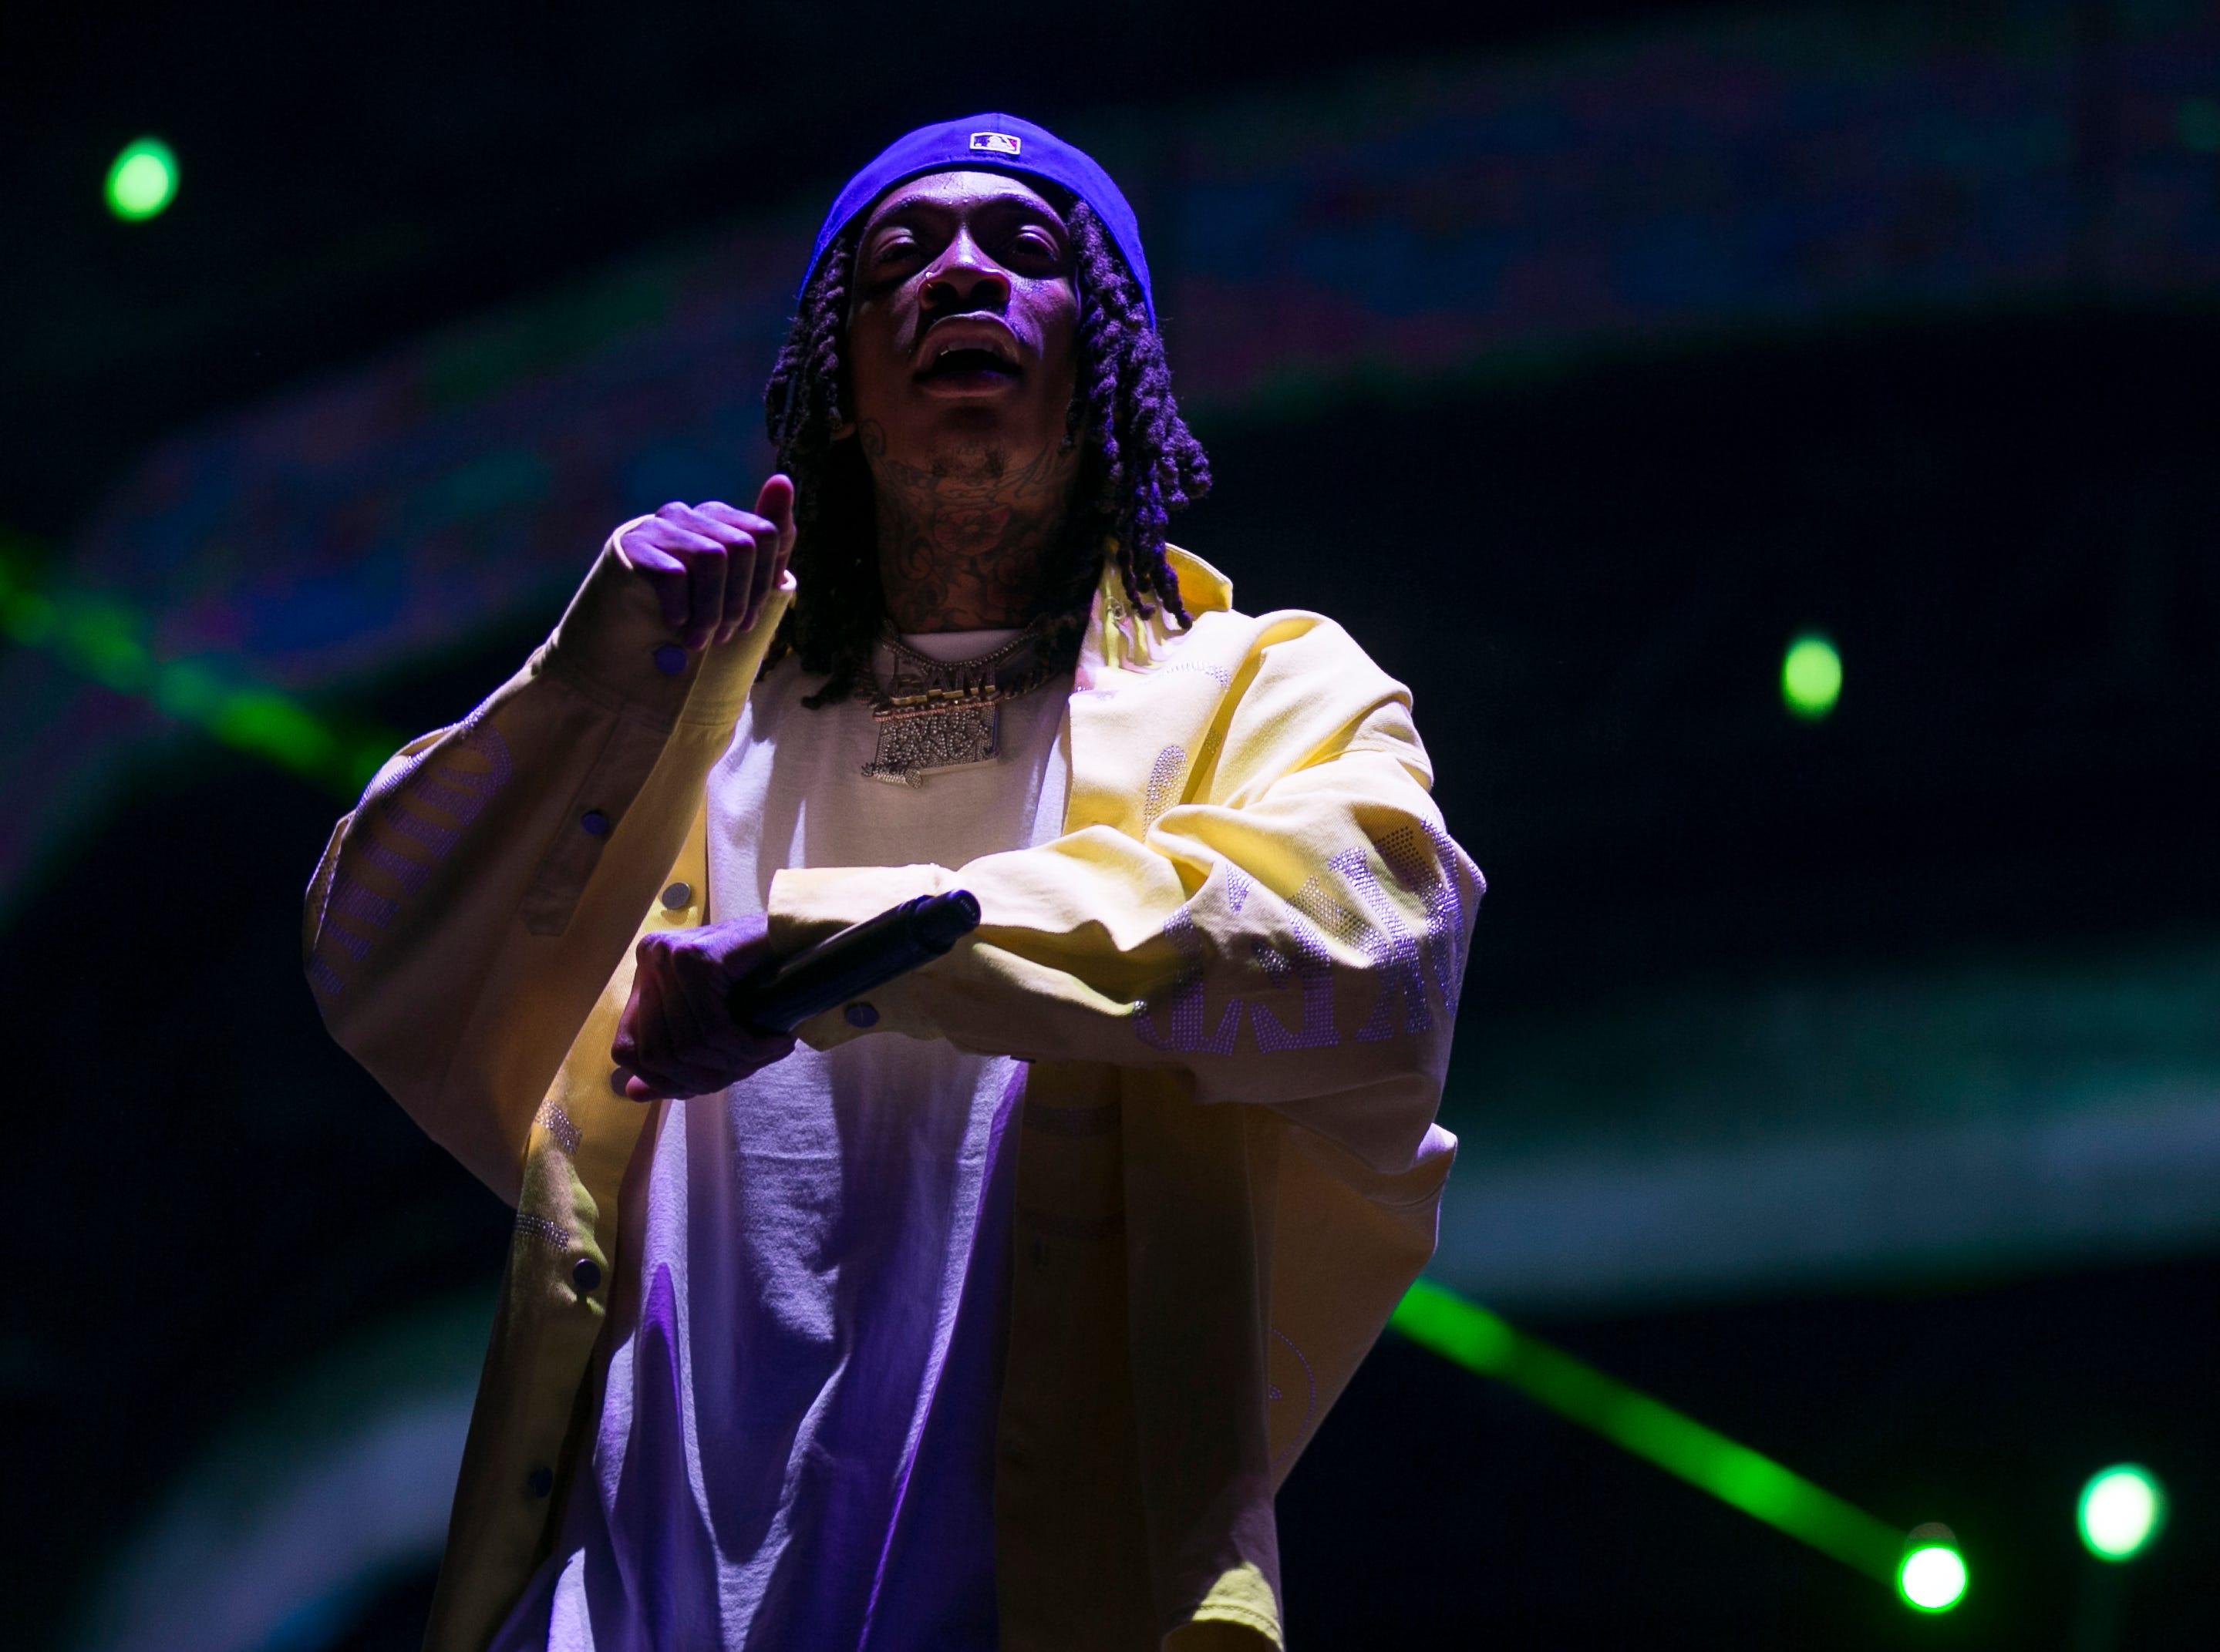 Wiz Khalifa performs at Coachella 2019 in Indio, Calif. on Sat. April 13, 2019.